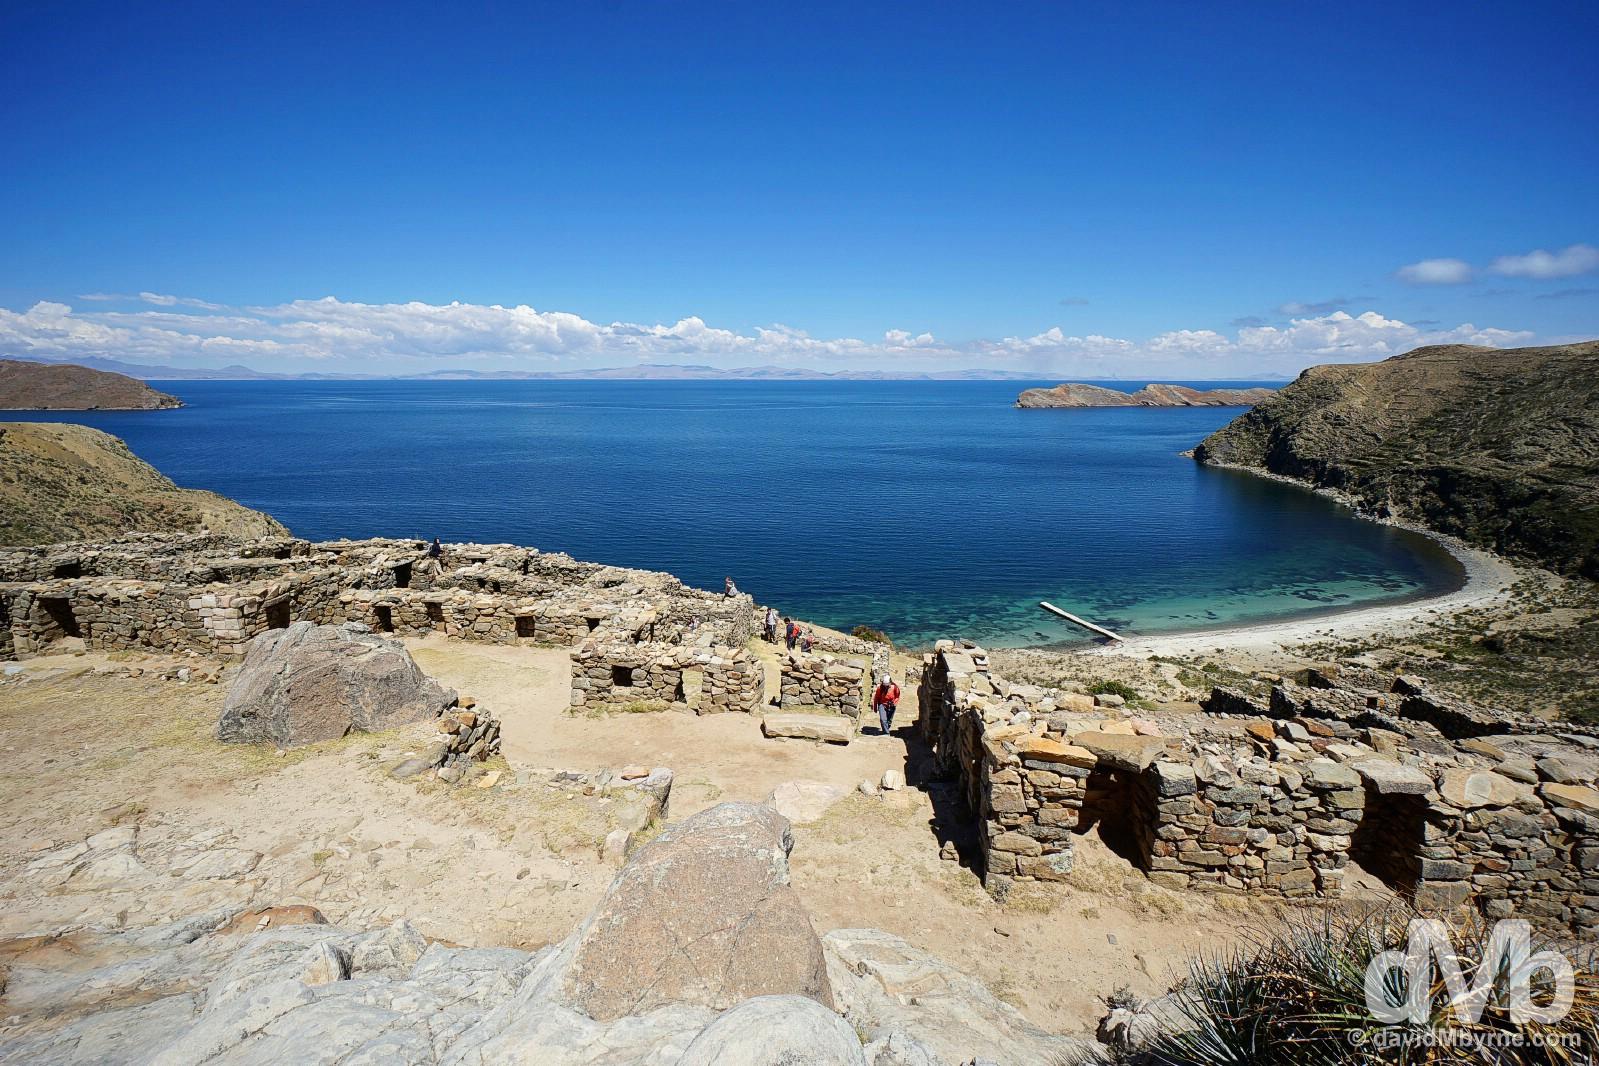 Inca ruins on Isla del Sol overlooking Lake Titicaca, Bolivia. August 24, 2015.